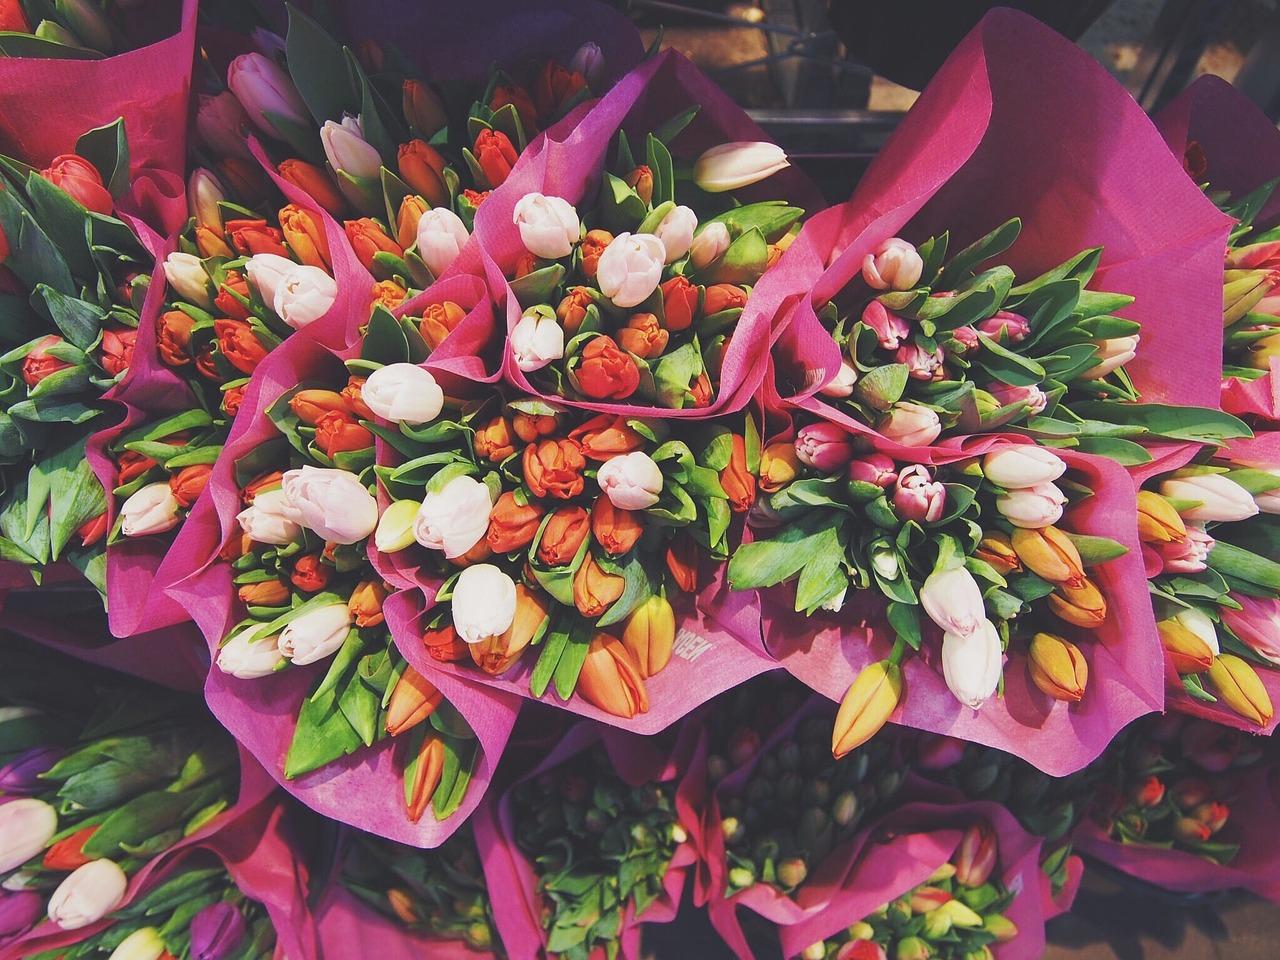 flowers-1245820_1280